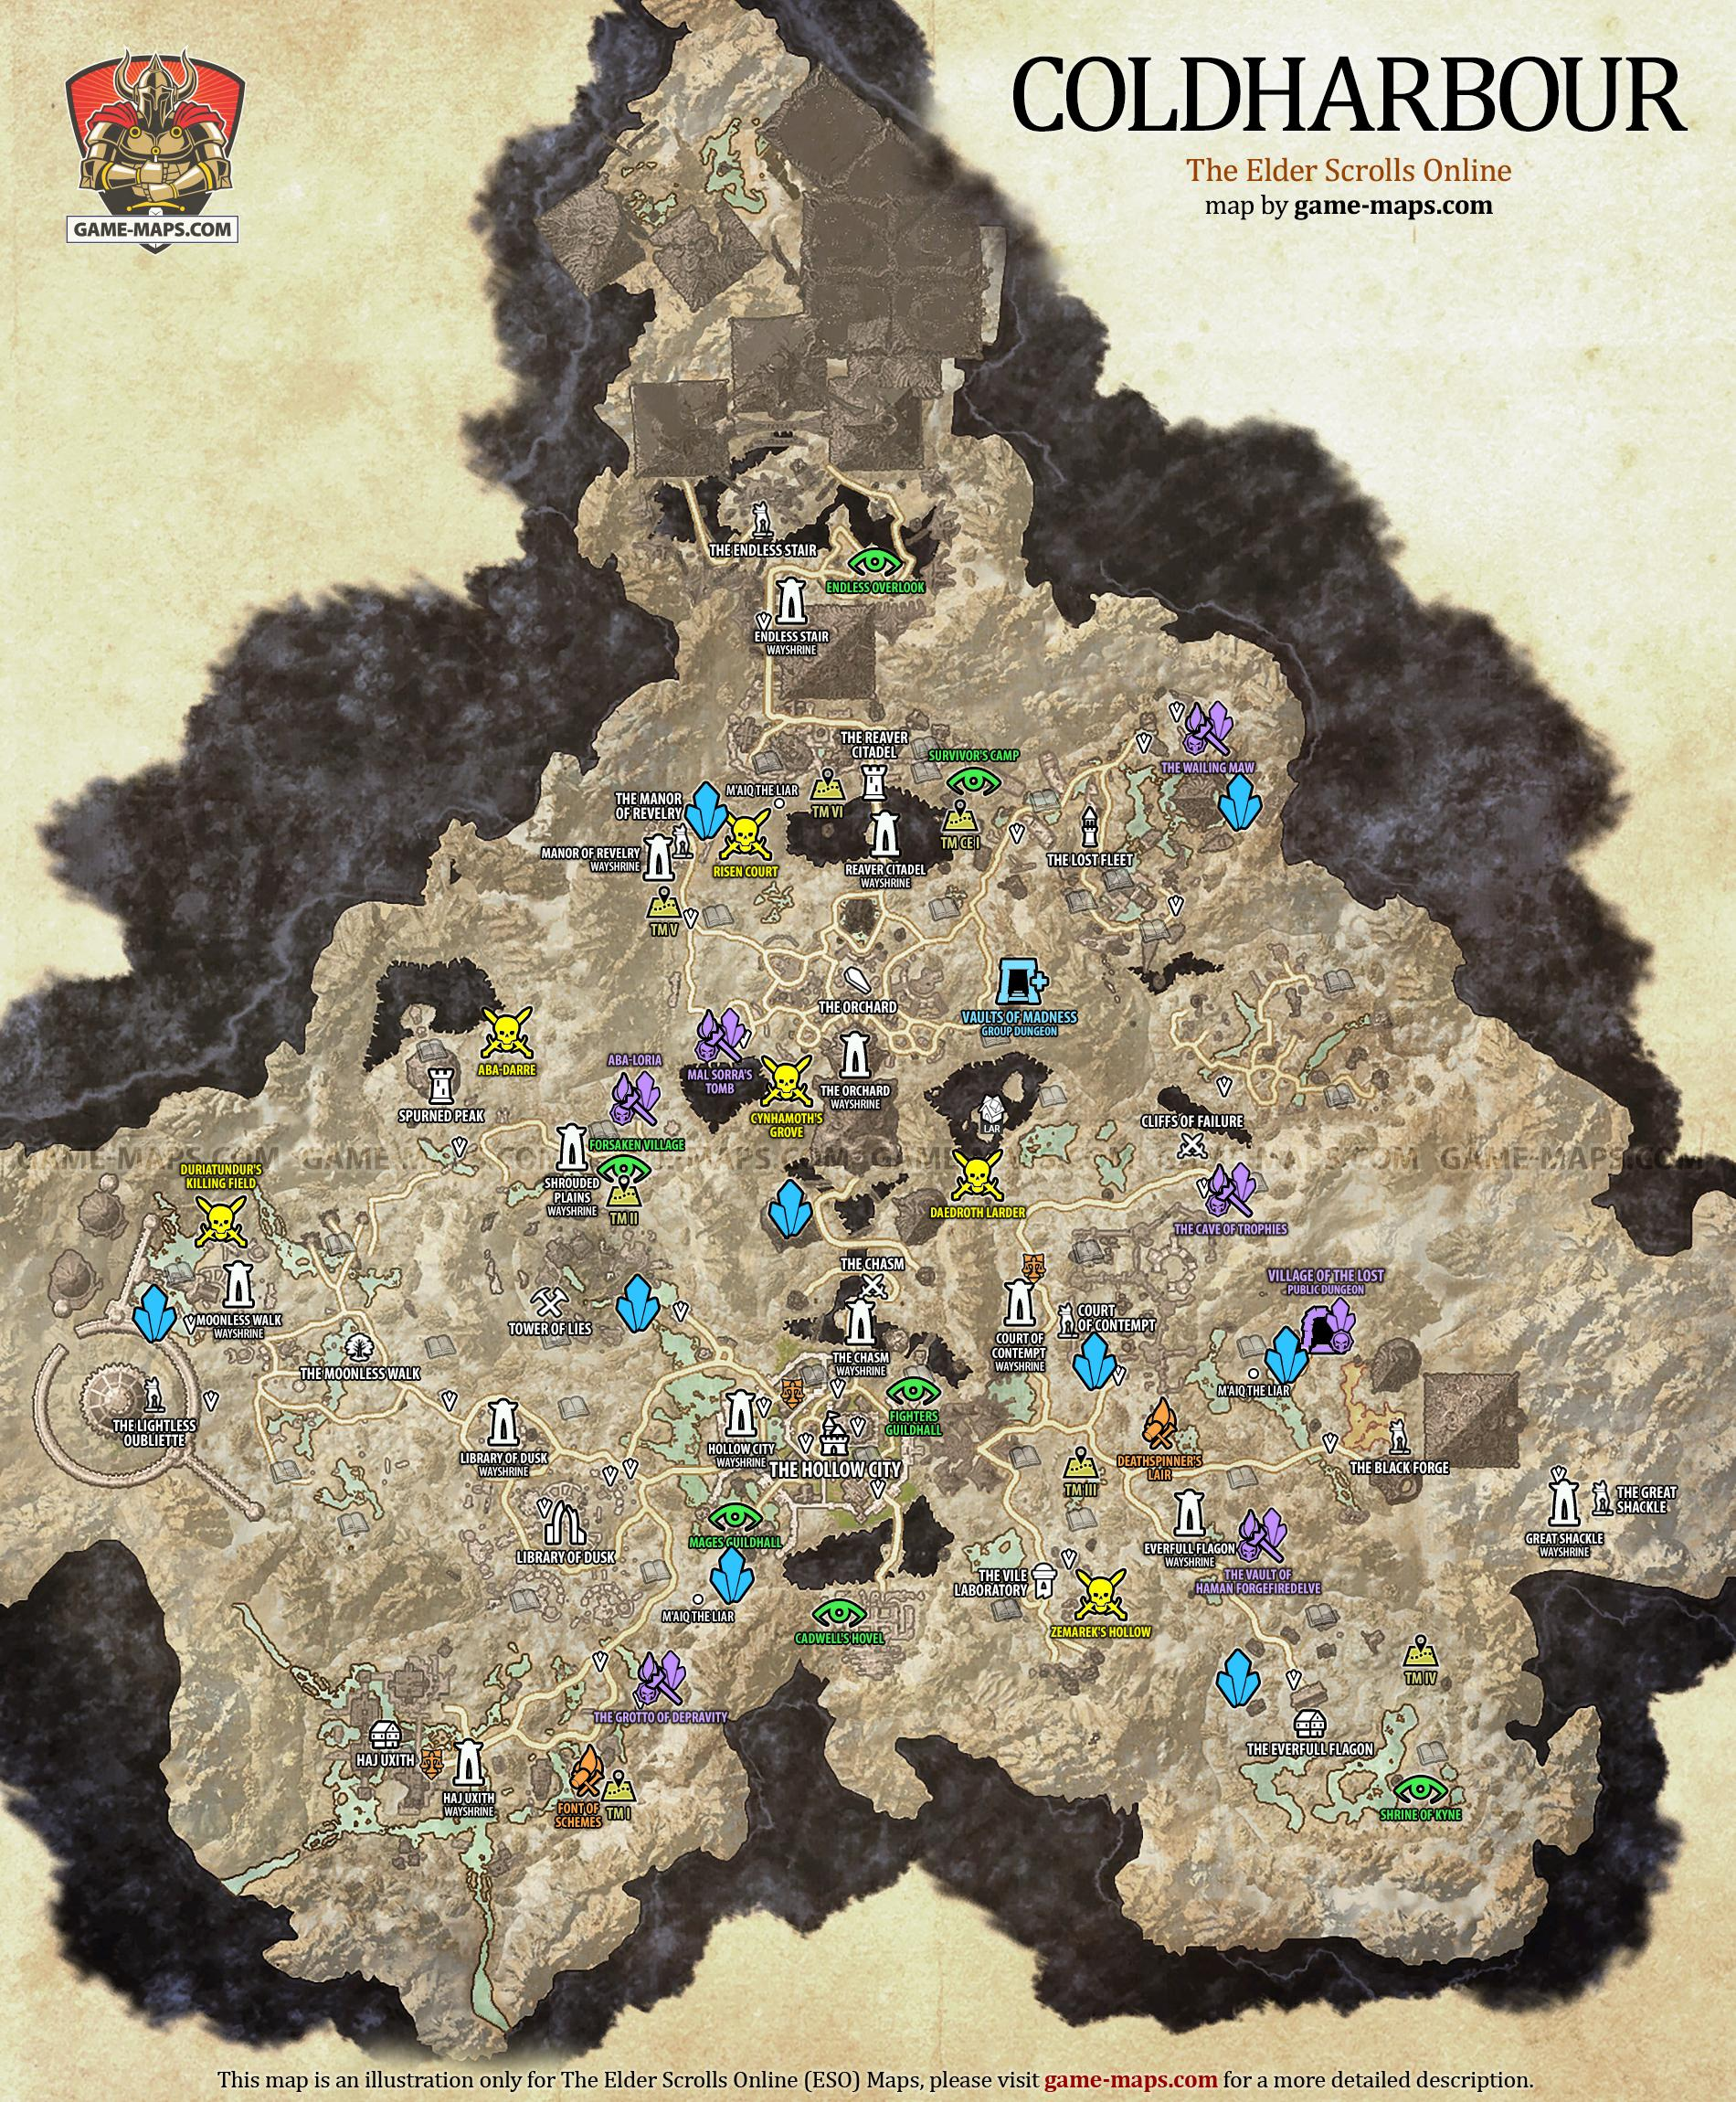 Coldharbour Map The Elder Scrolls Online game